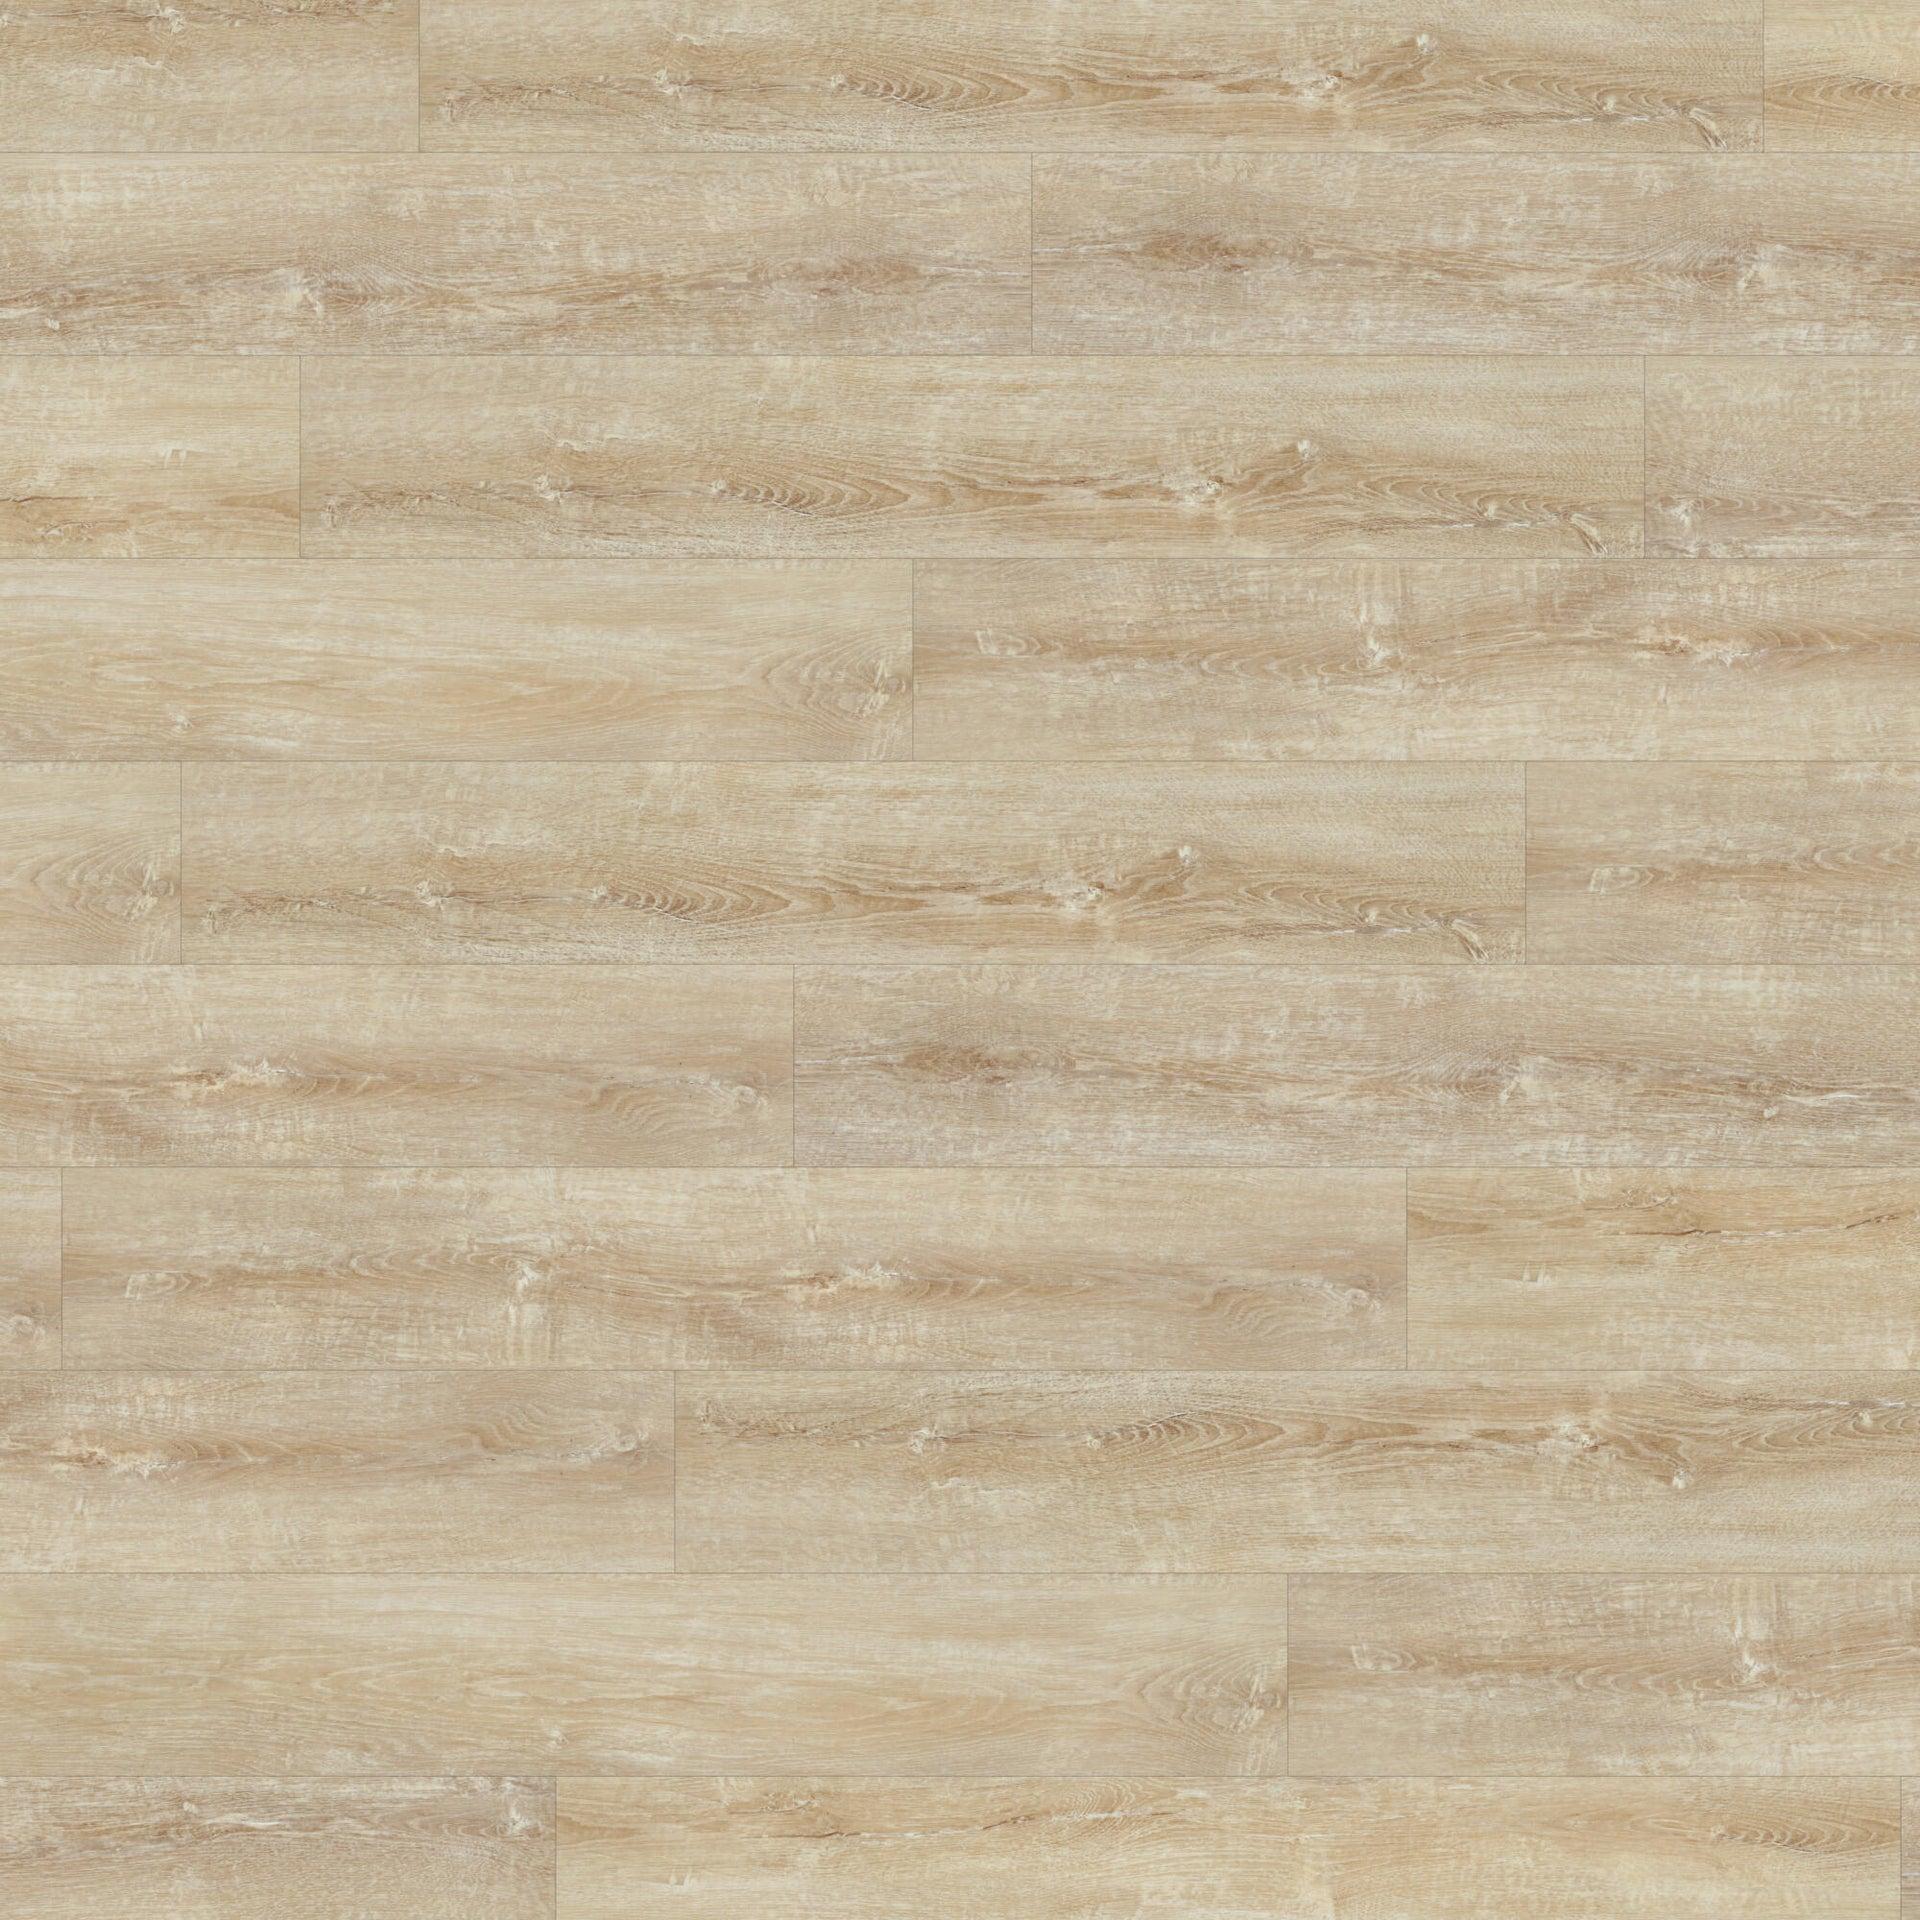 Pavimento PVC adesivo Senso Baladlight Sp 2.5 mm beige - 4